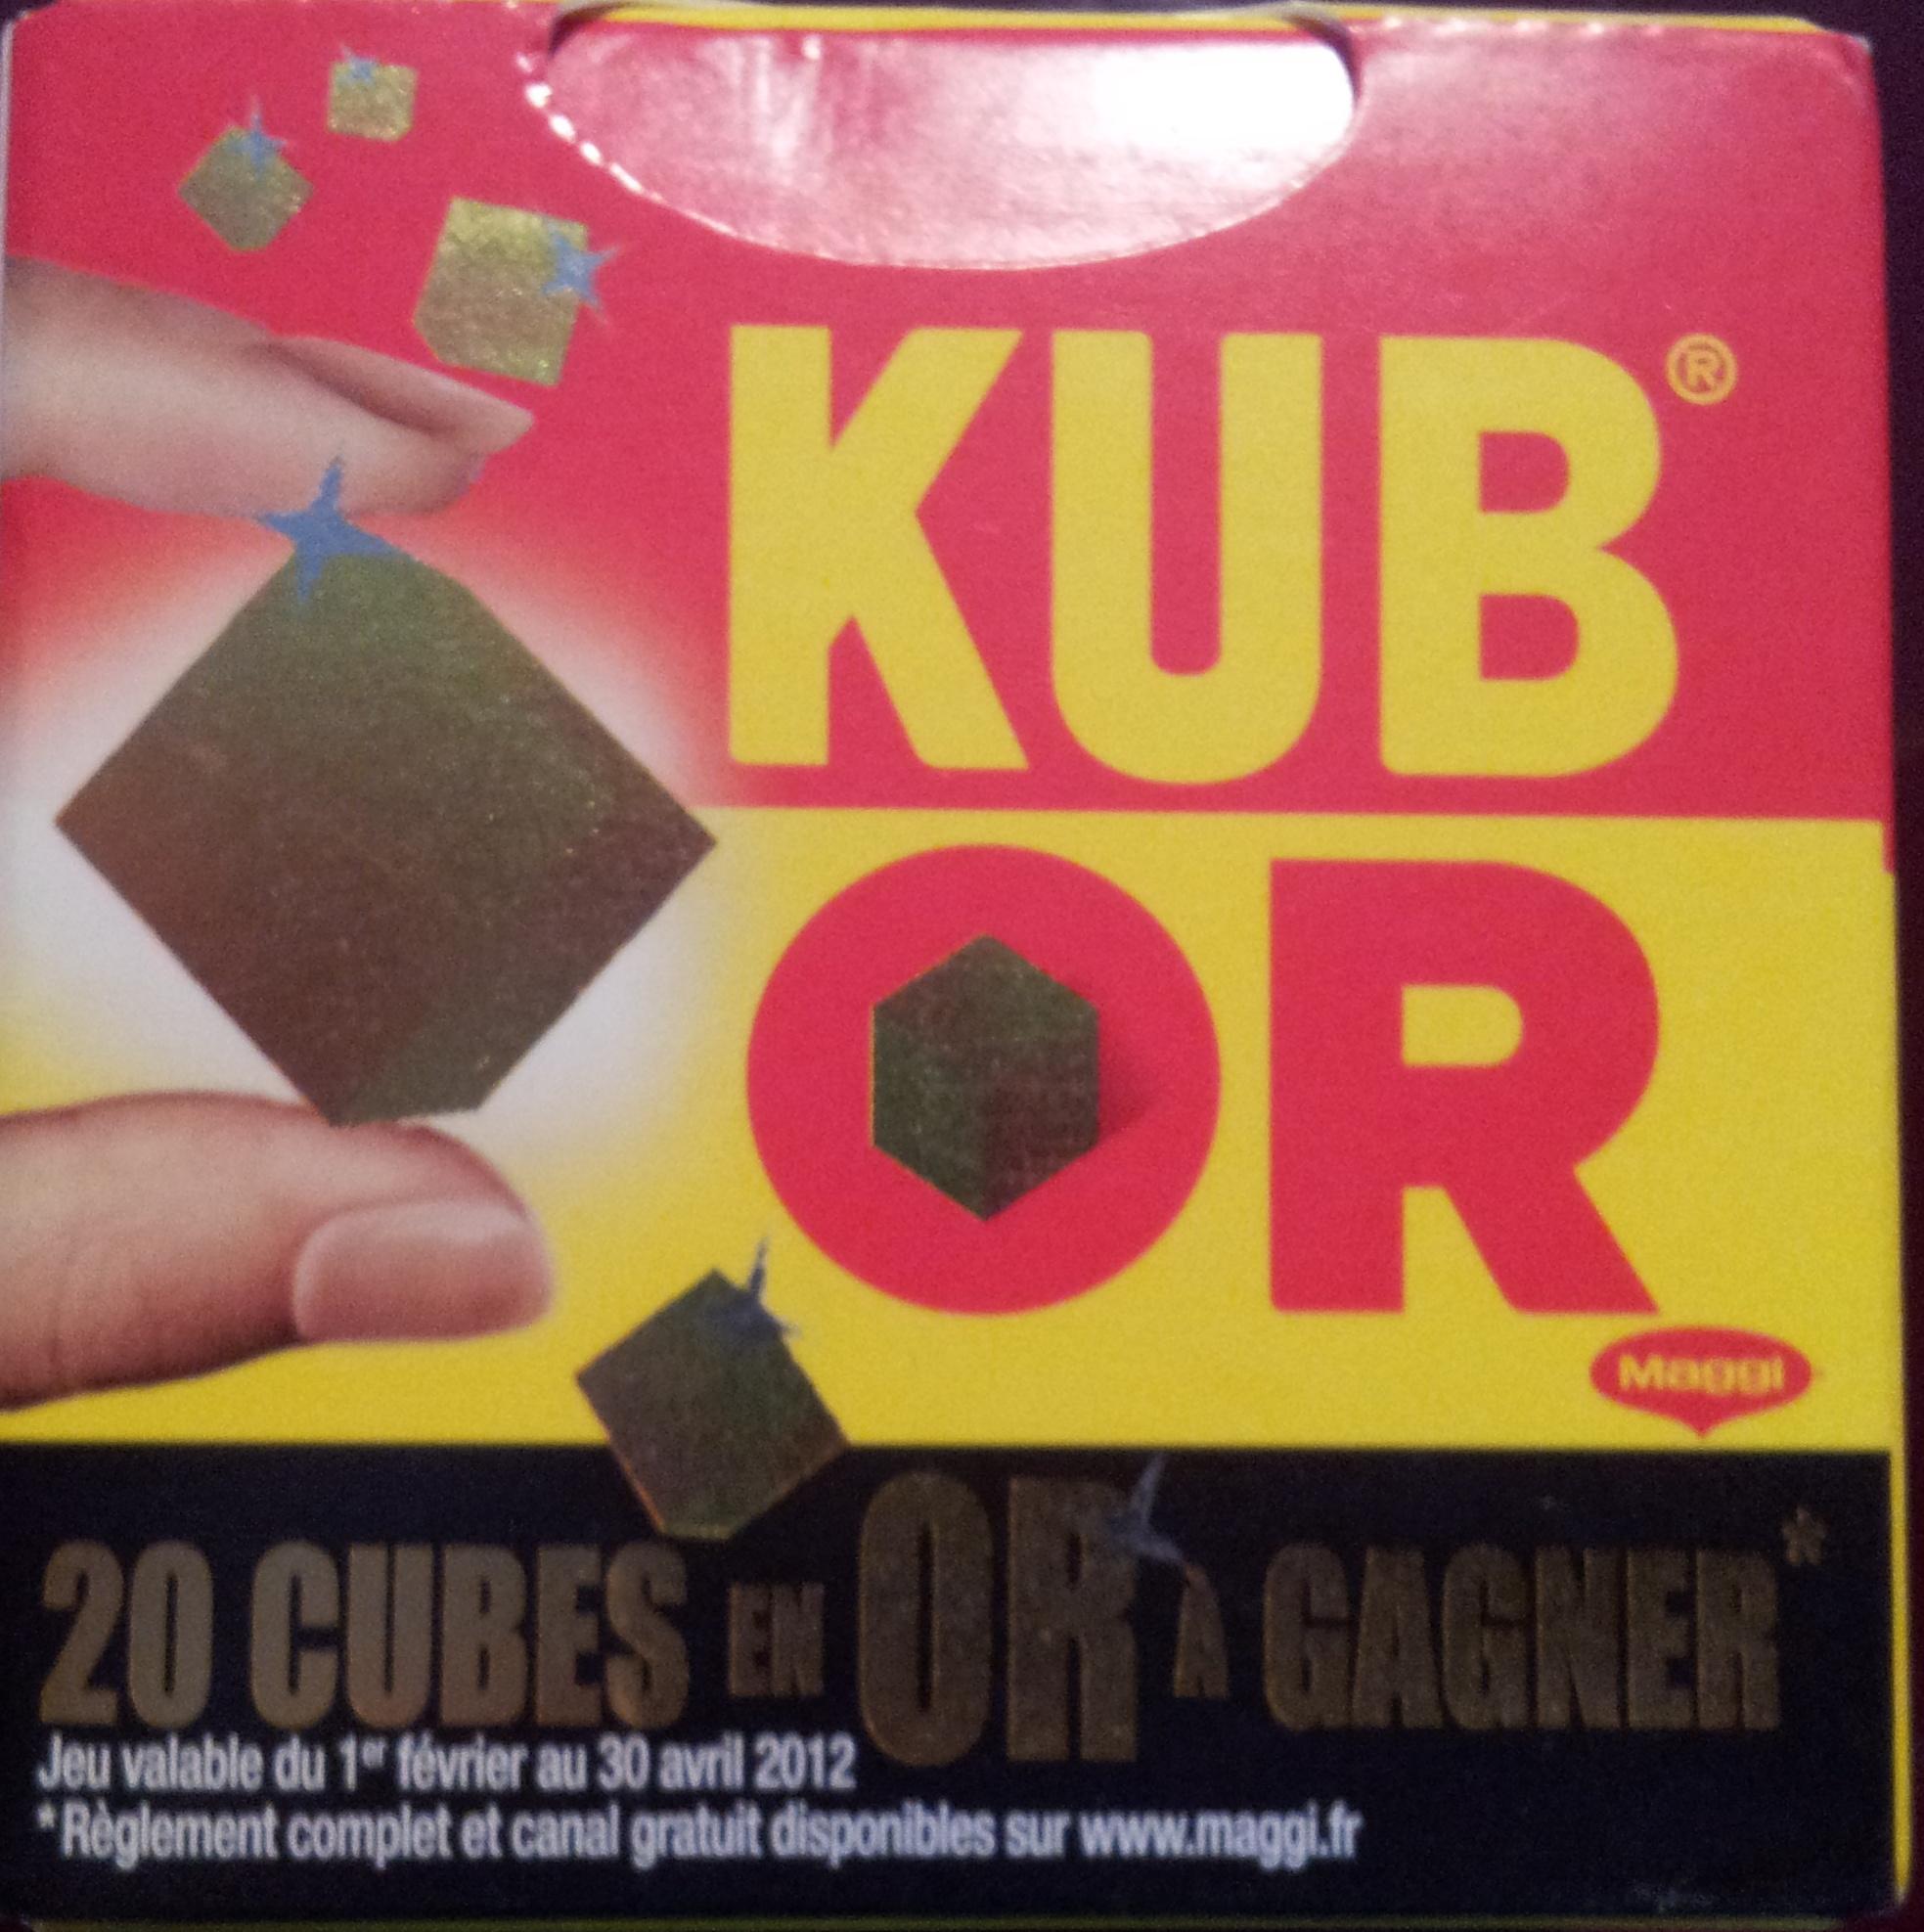 KUB ® Or - Product